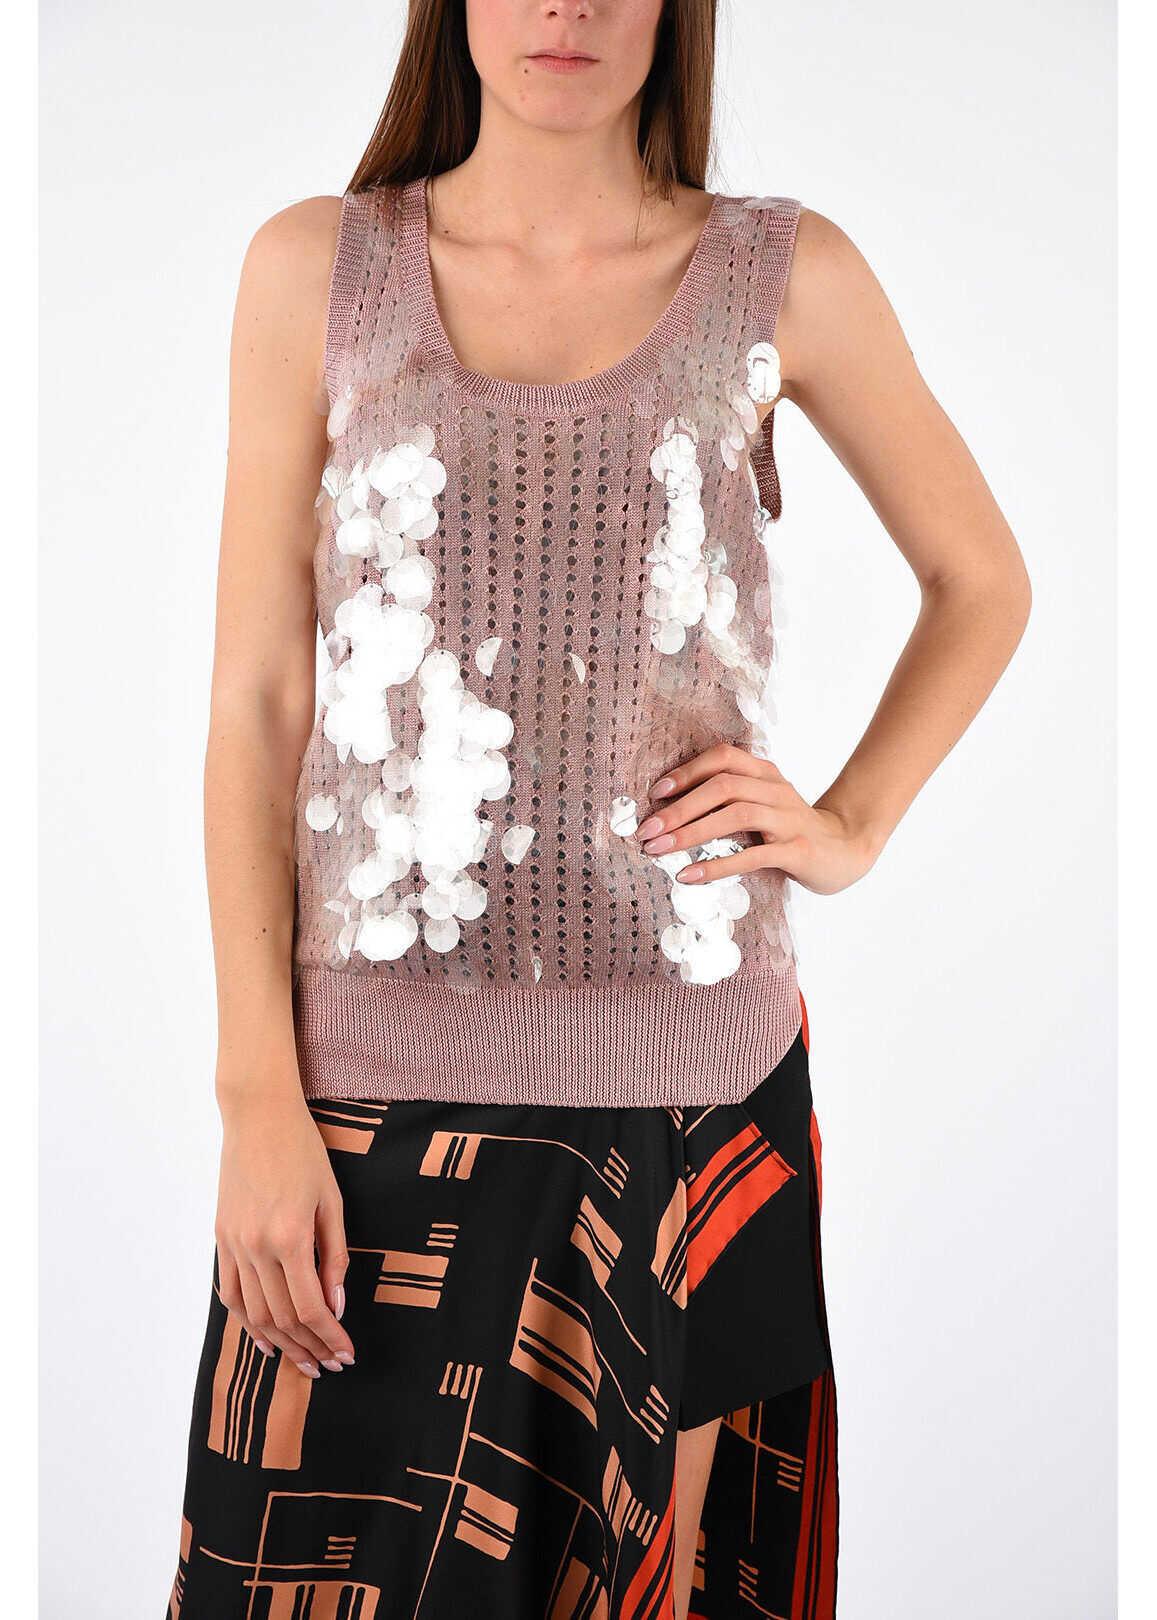 Bottega Veneta Sequin Knitted Top PINK